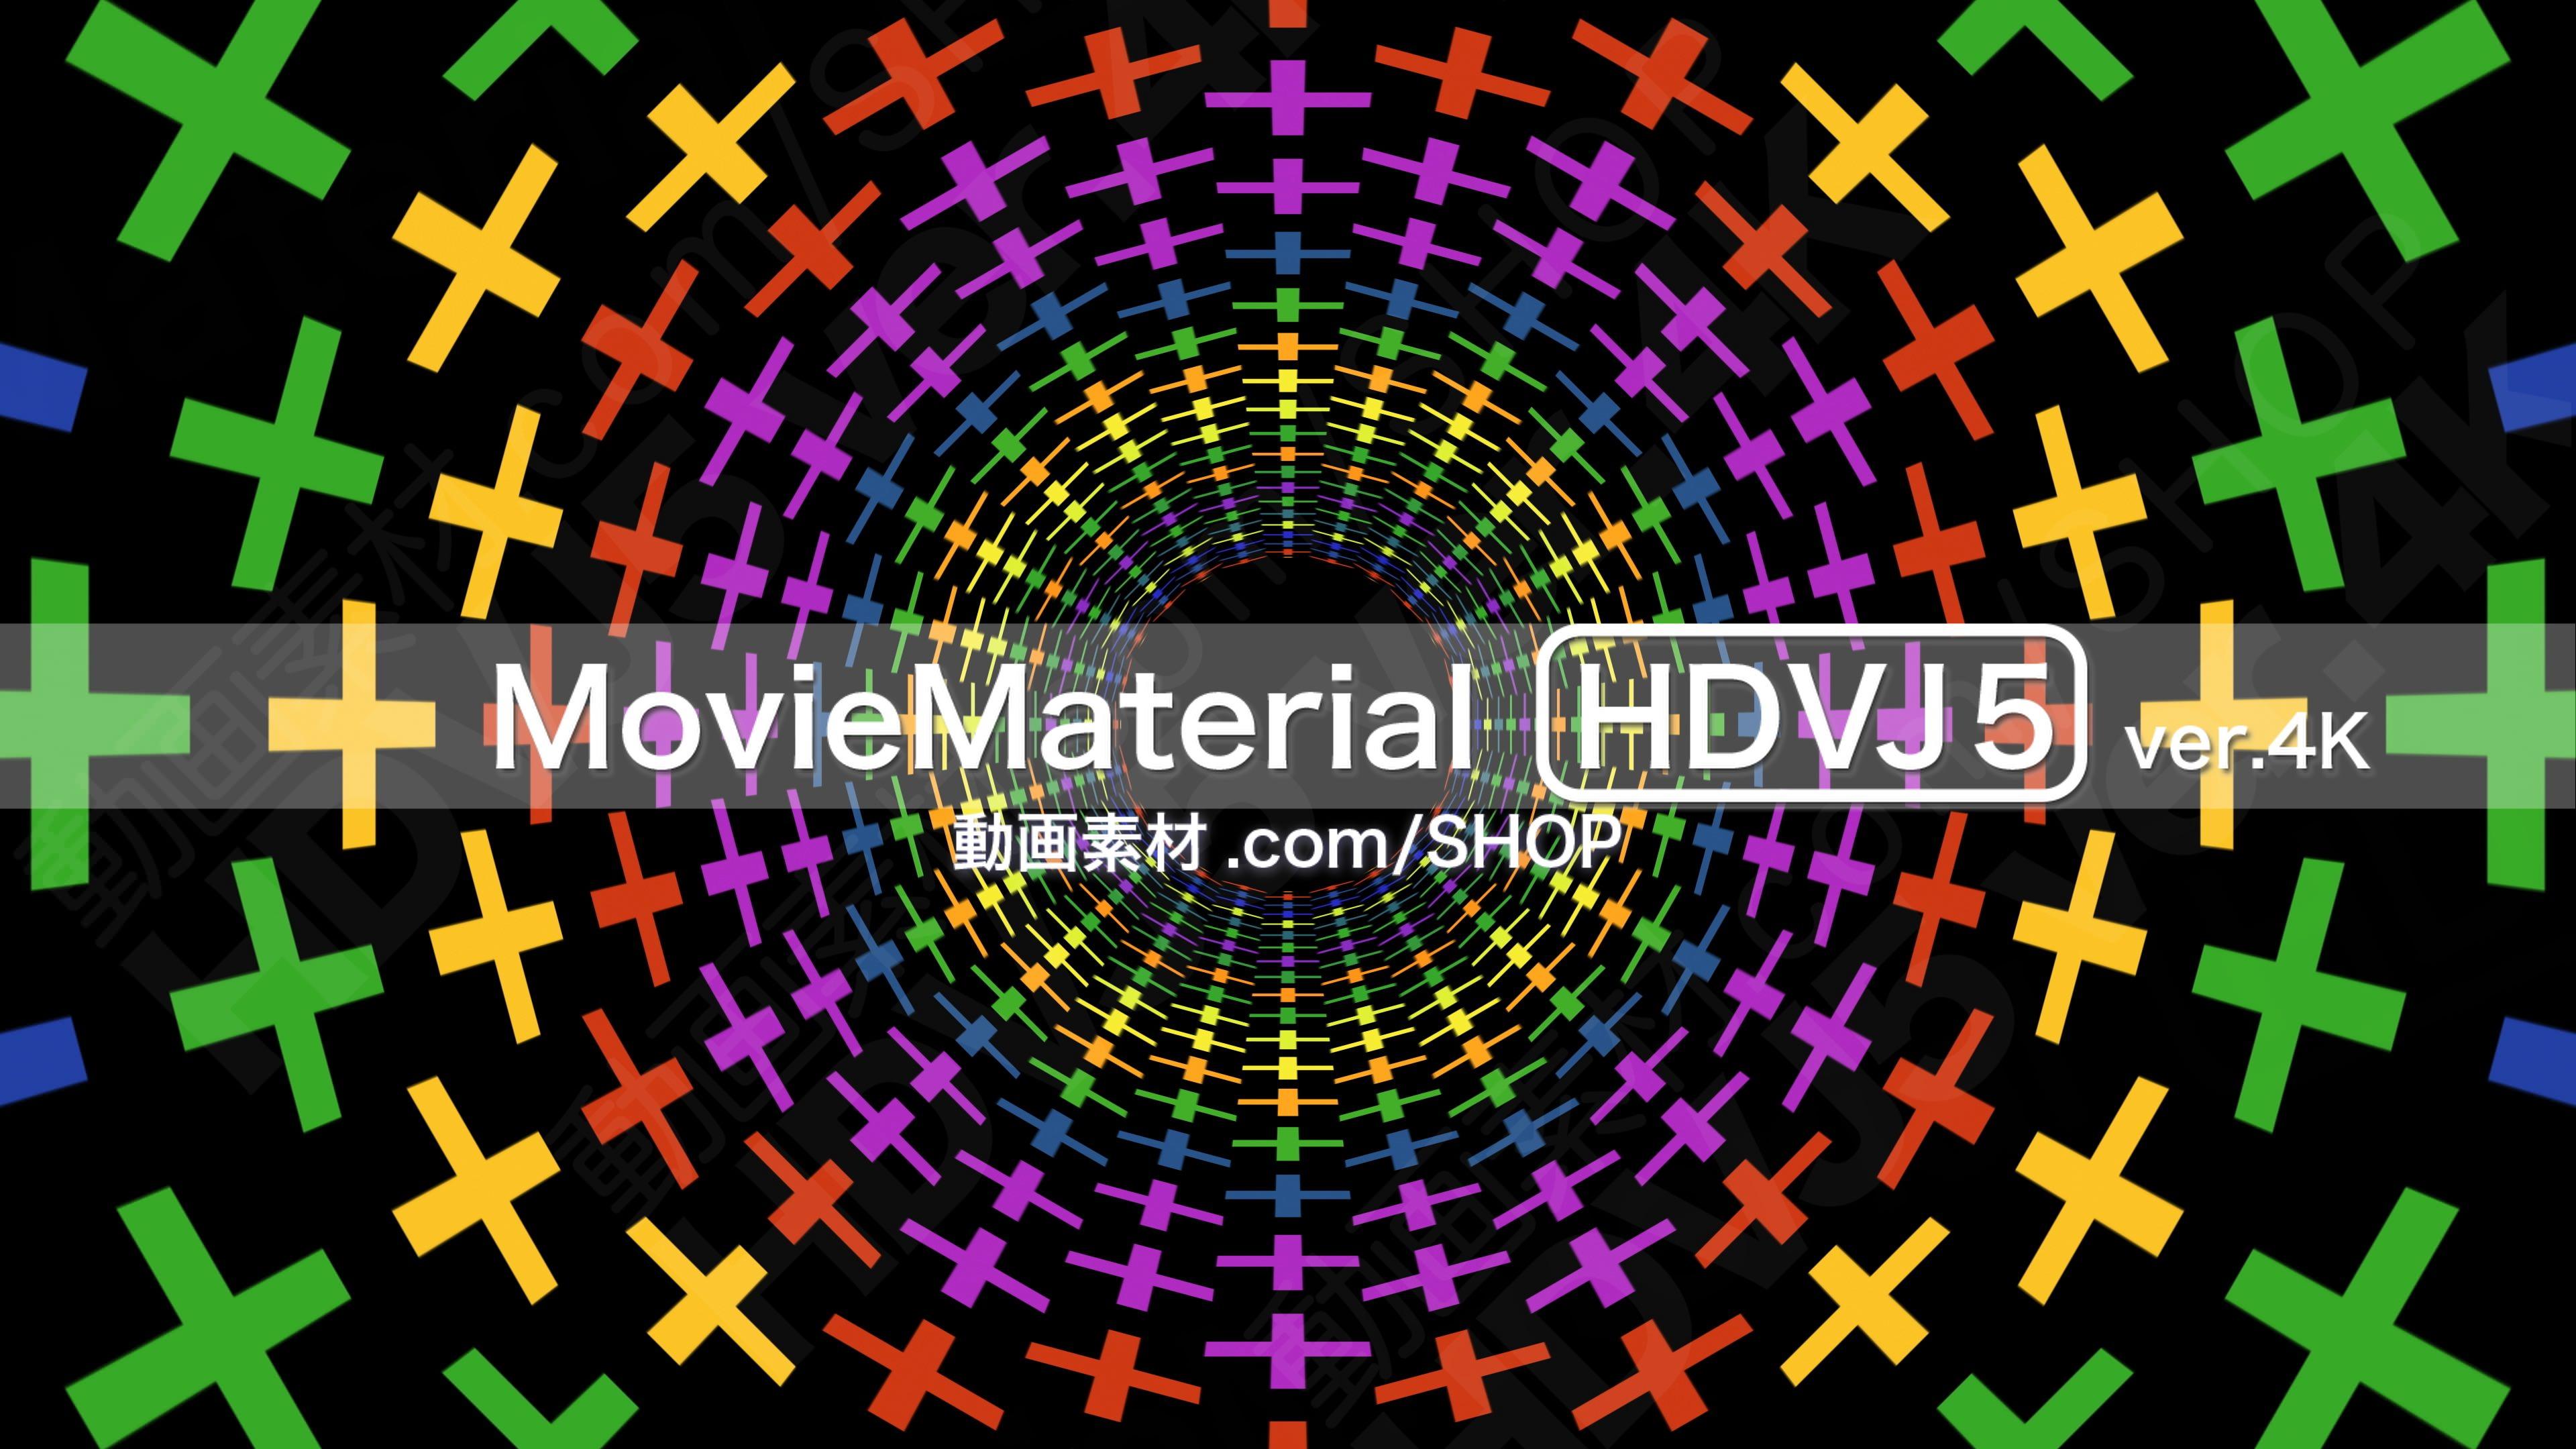 4K2Kループ動画素材集第5段【MovieMaterial HDVJ5 ver.4K】ロイヤリティフリー(著作権使用料無料)3